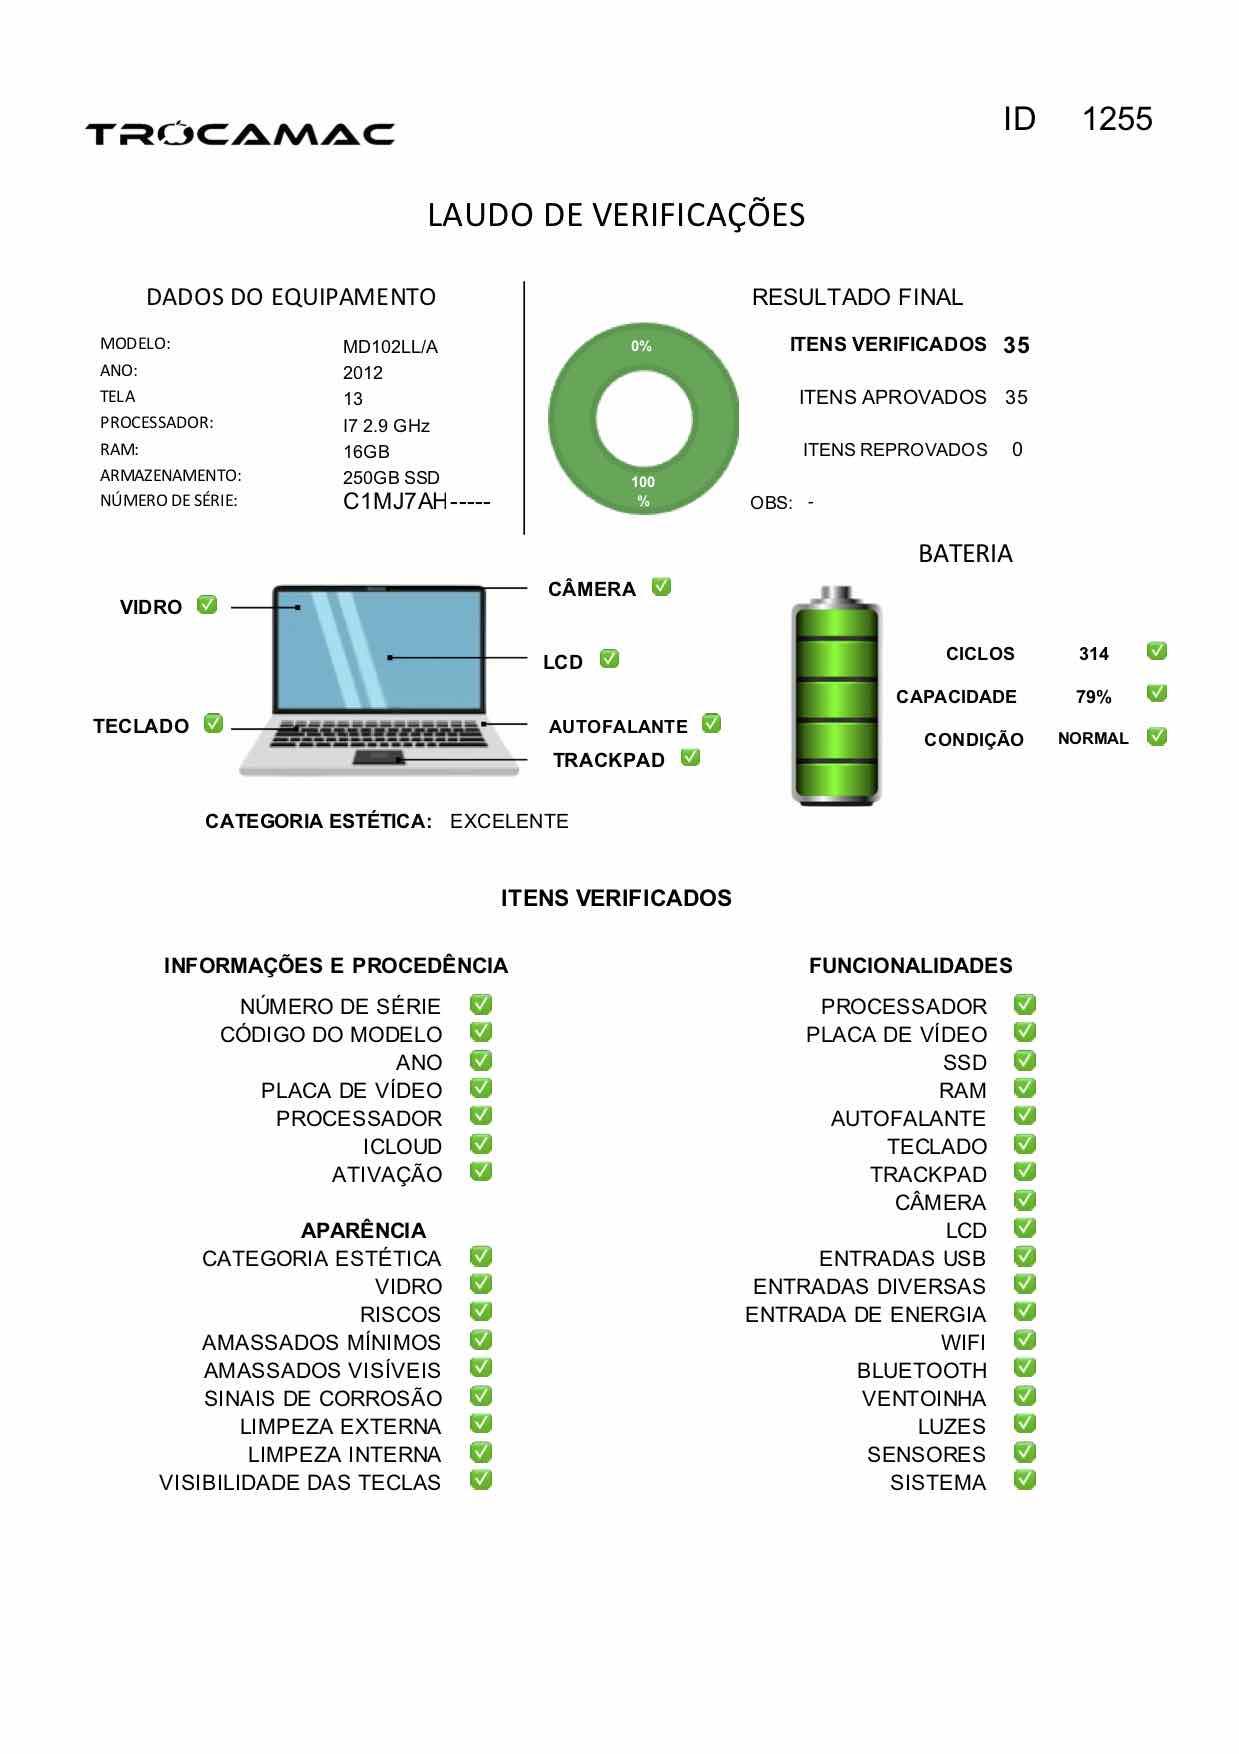 Macbook Pro 13 i7 2.9GHZ 16GB 256GB SSD MD102LL/A Seminovo